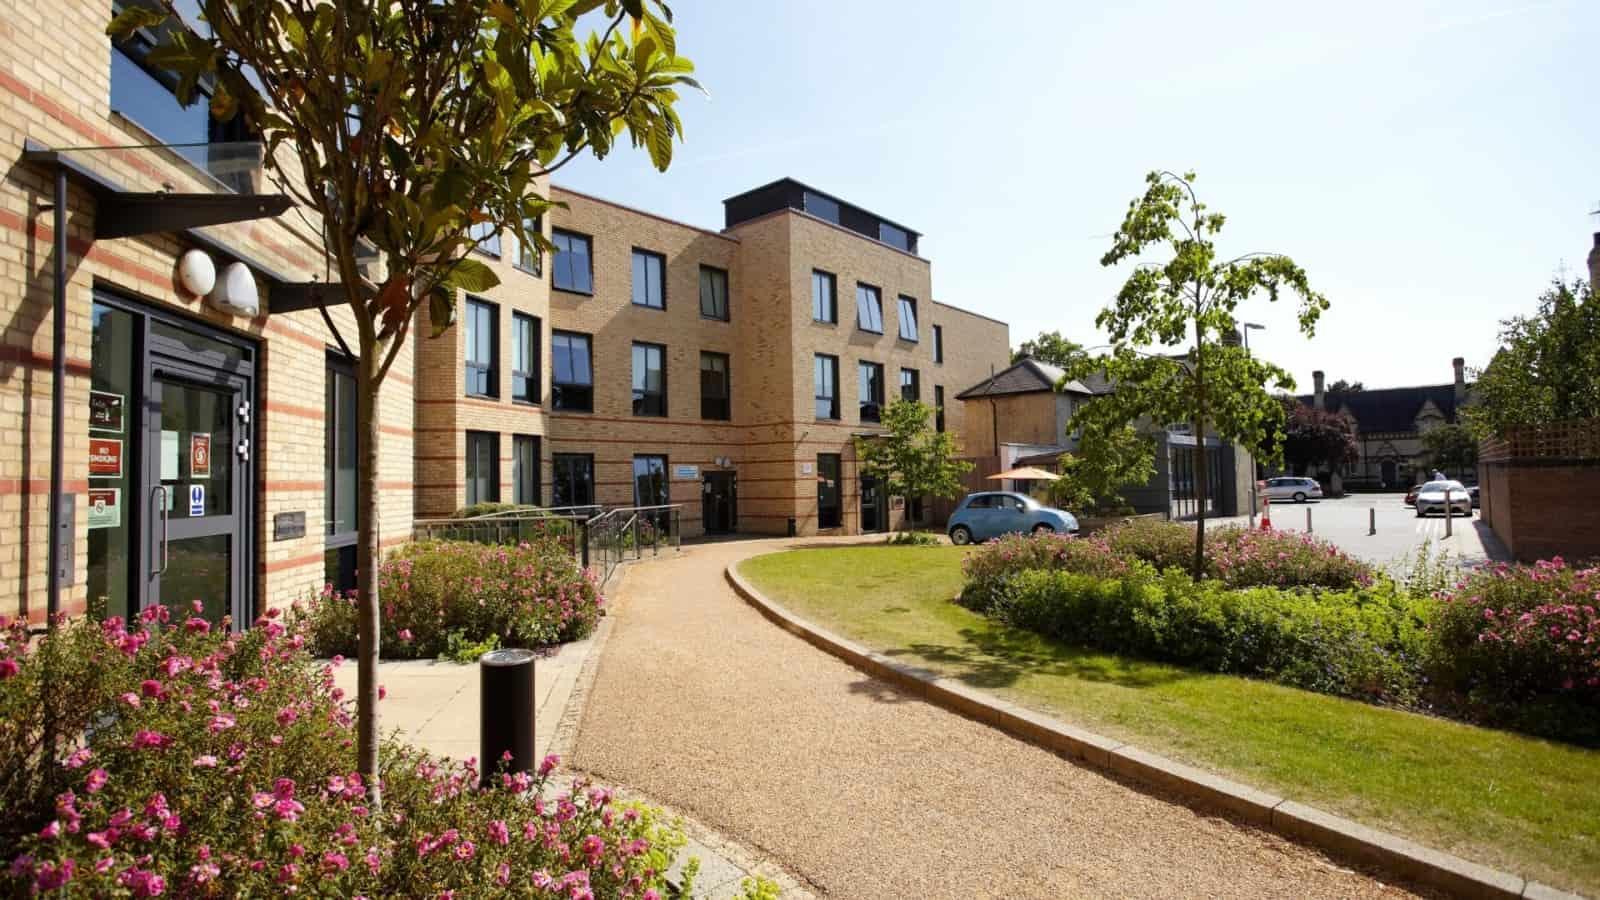 Cambridge cb1 summer accommodation